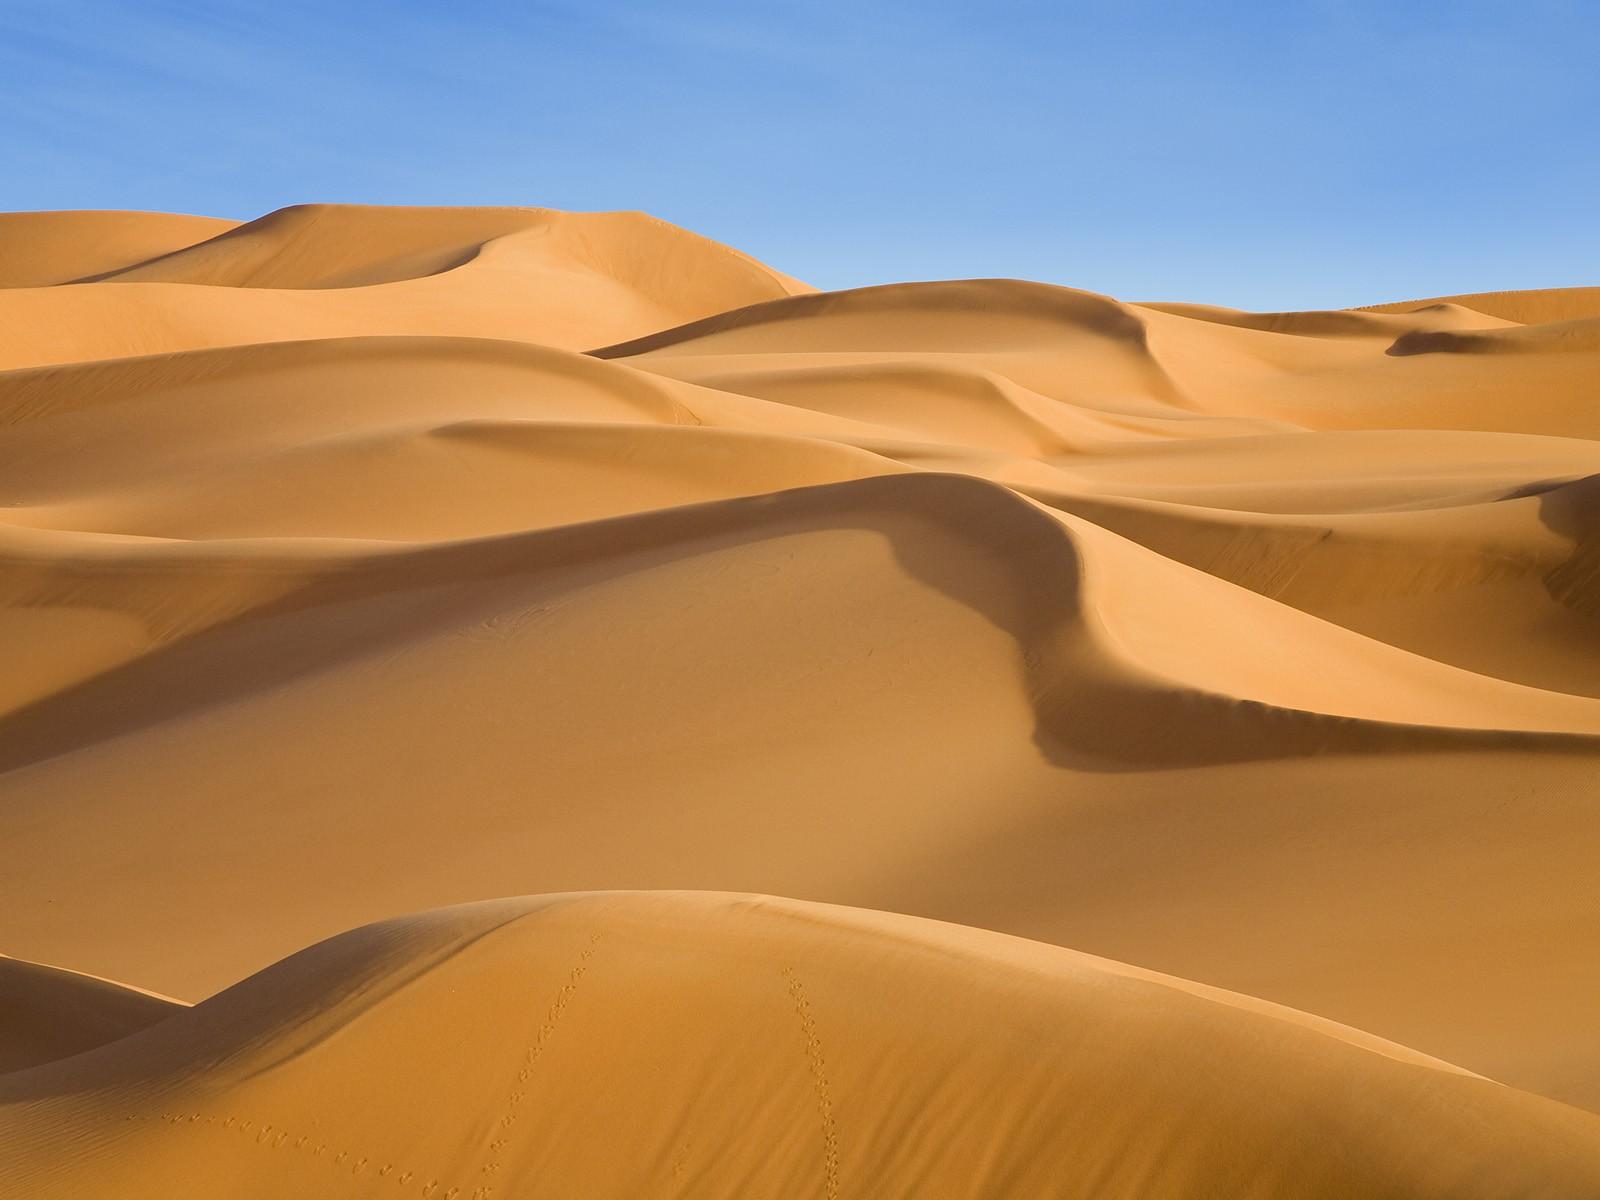 Desert Landscape Wallpaper Hd Desktop 10 HD Wallpapers